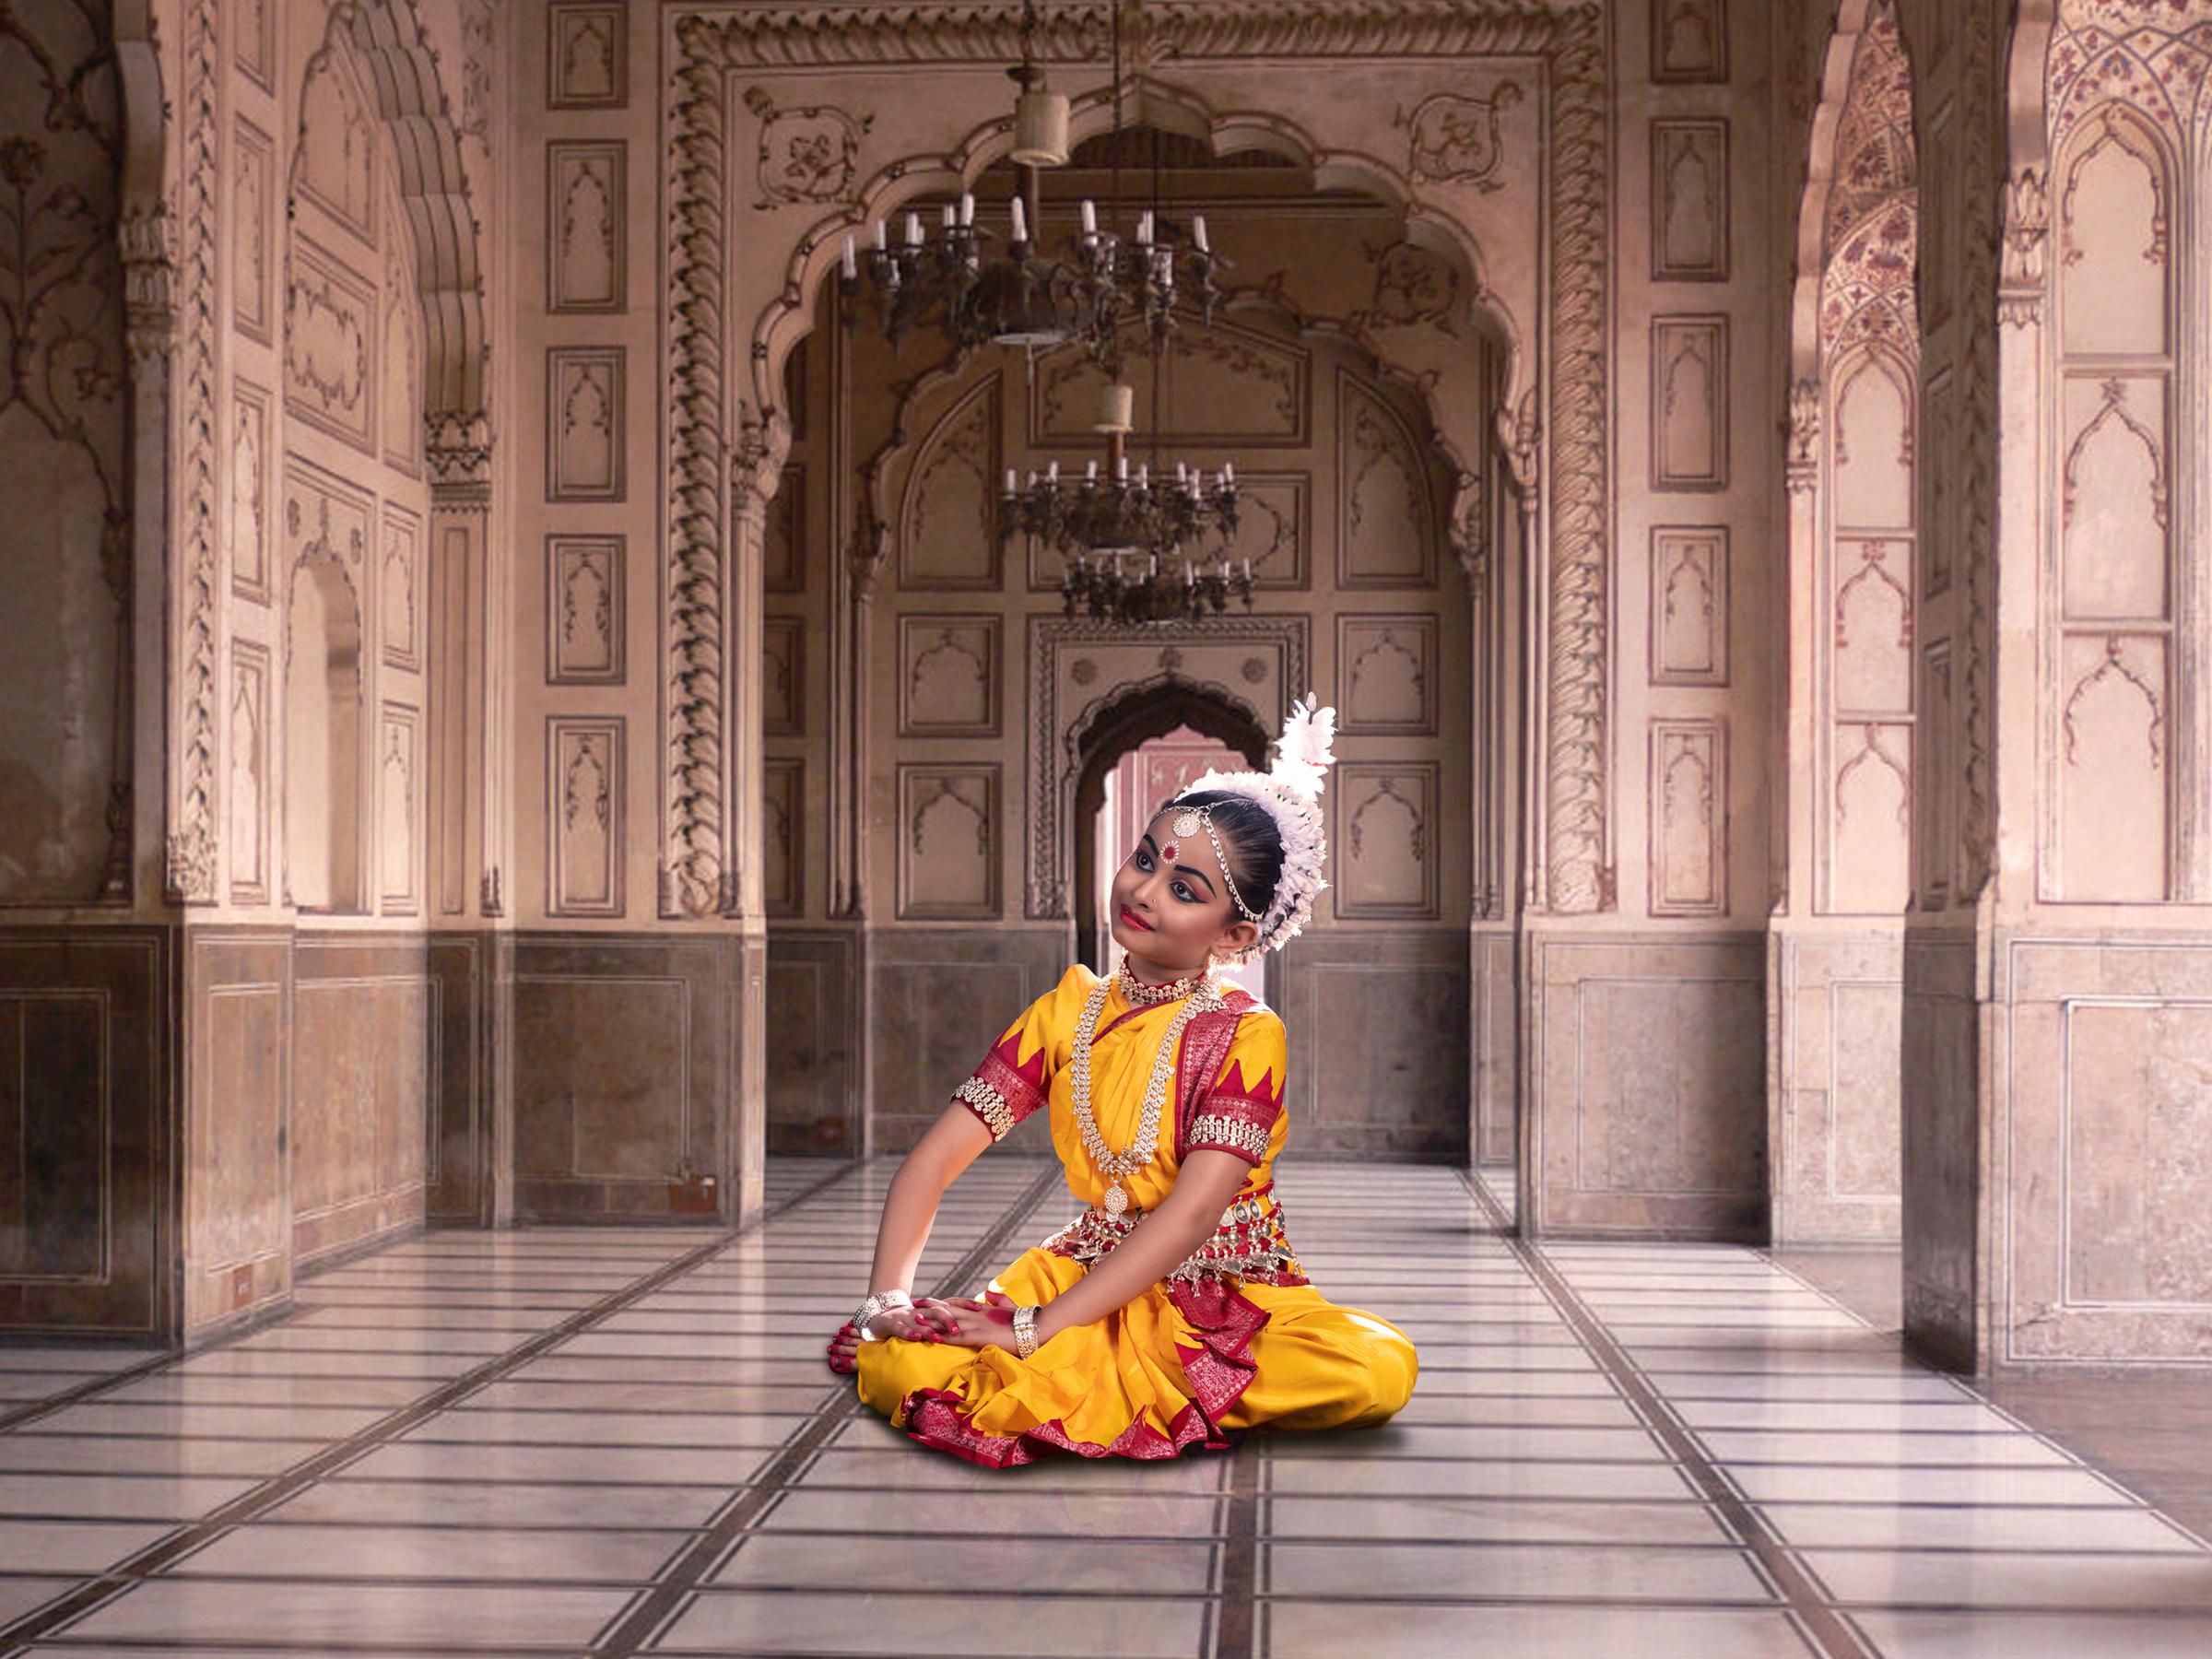 A classical dancer